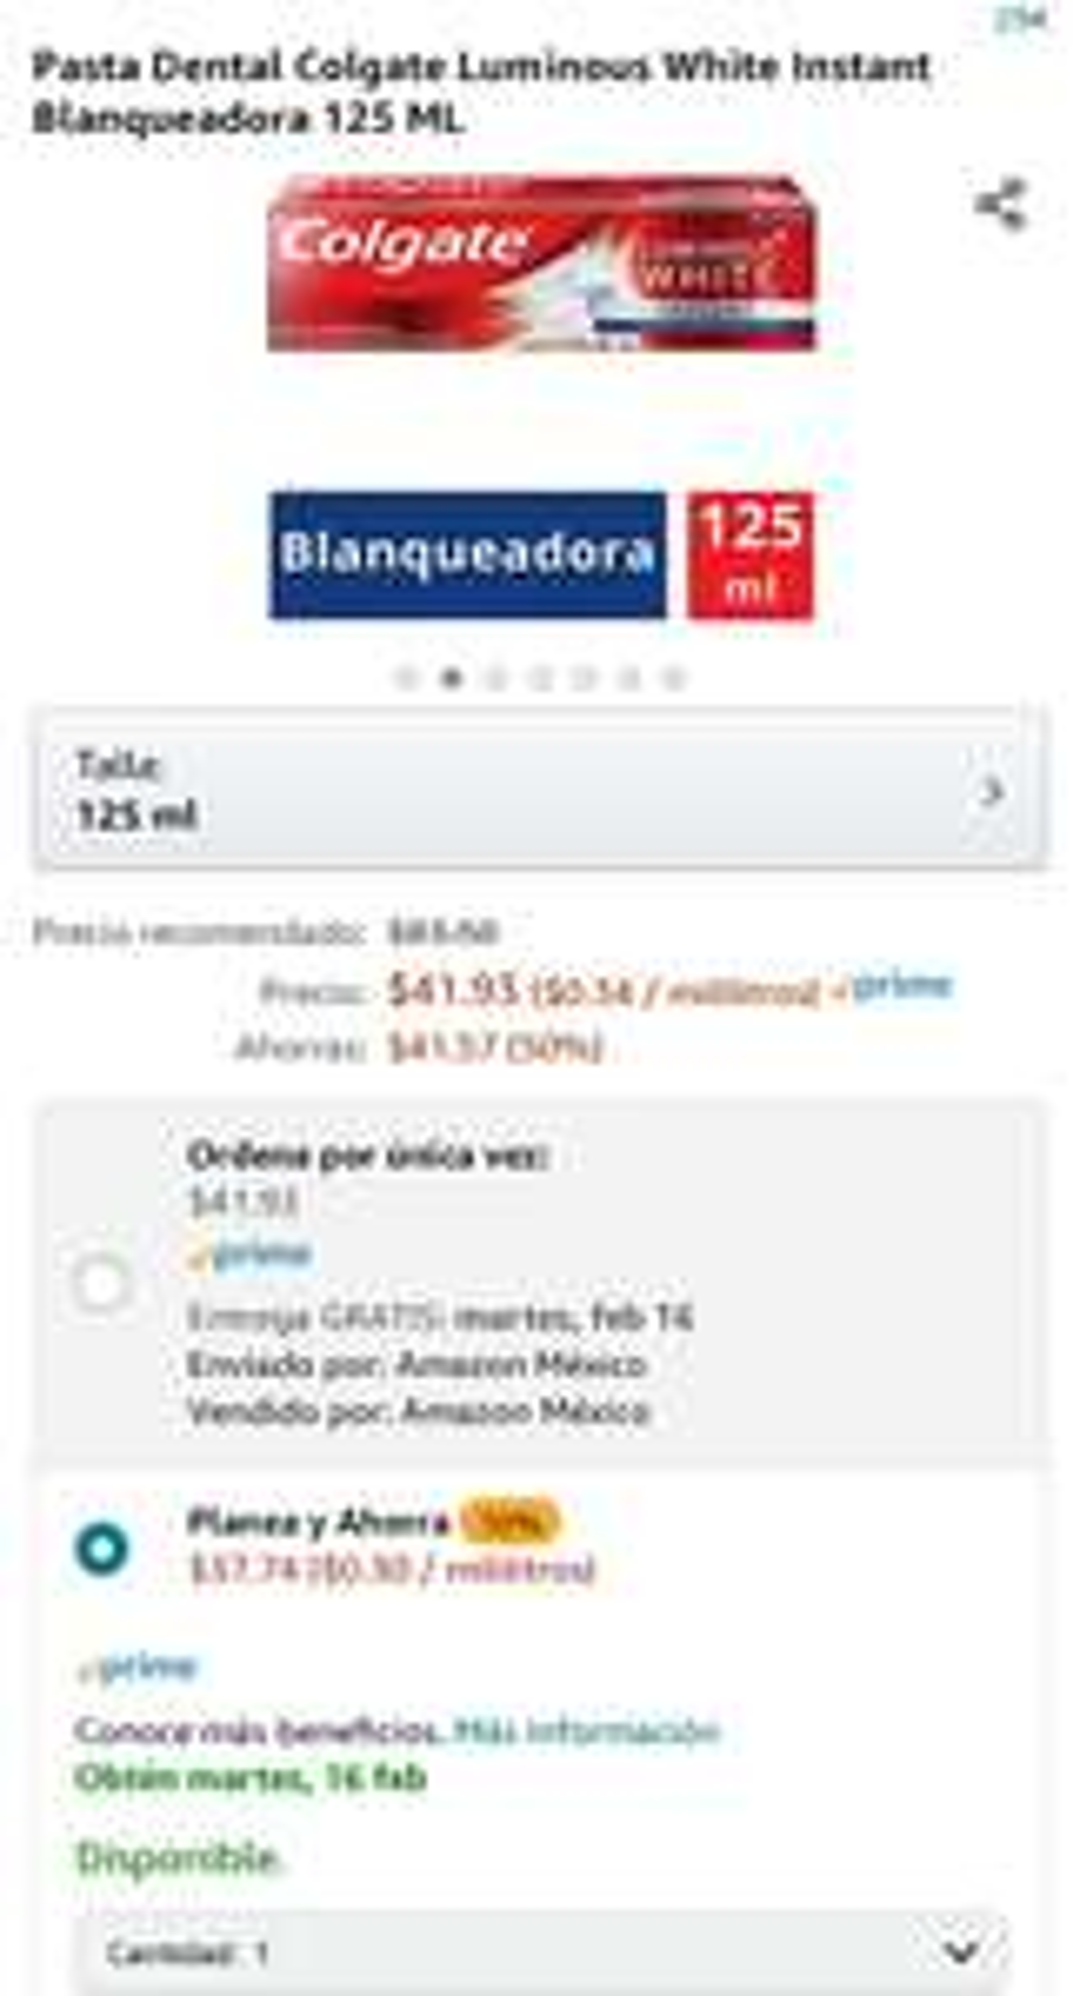 Amazon: Pasta Dental Colgate Luminous White Instant Blanqueadora 125 ML